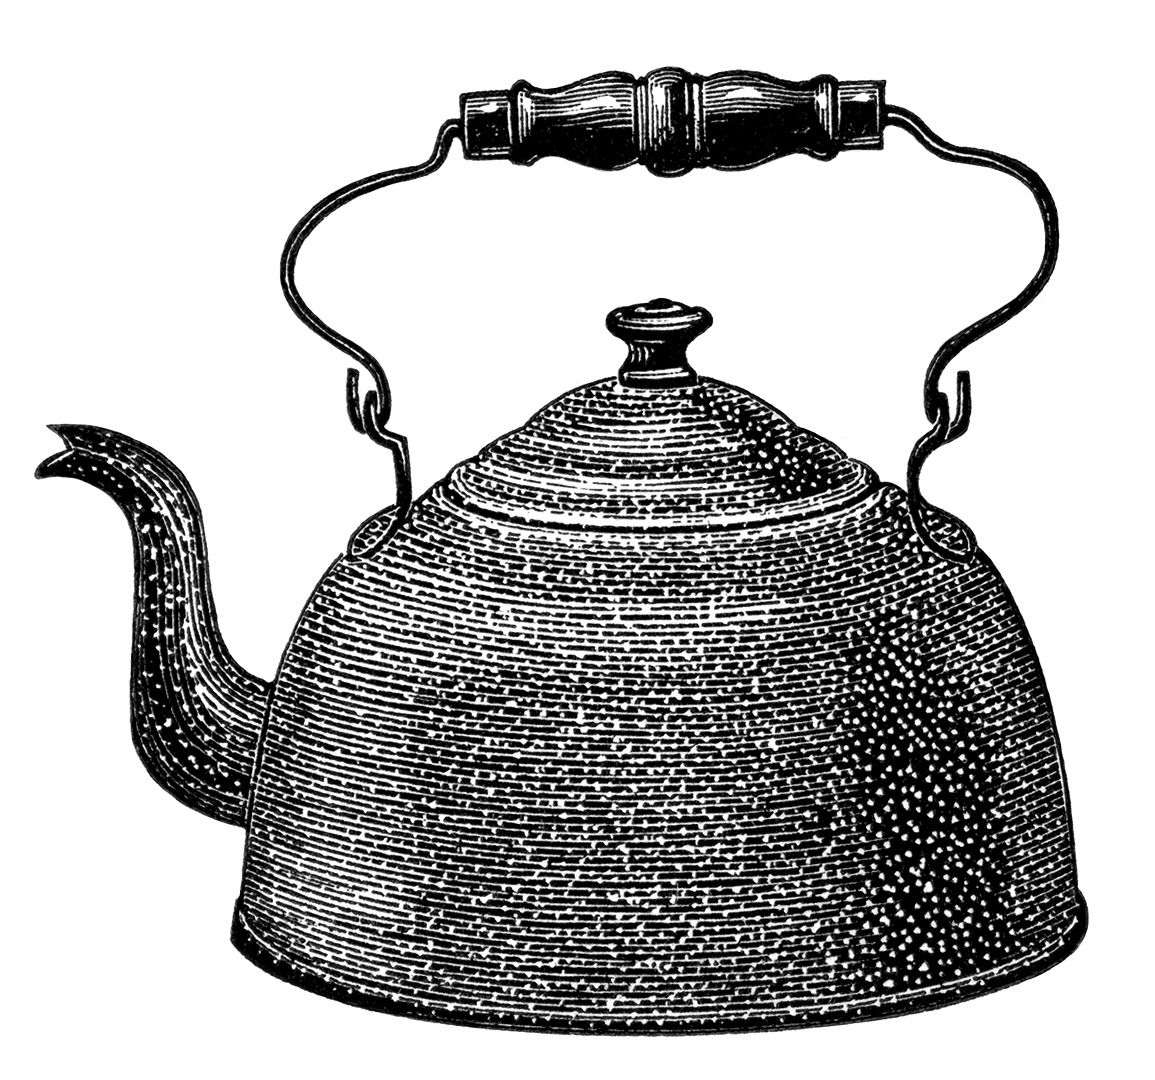 Kitchen Design Clip Art: Black And White Clip Art, Enamel Kettle Illustration